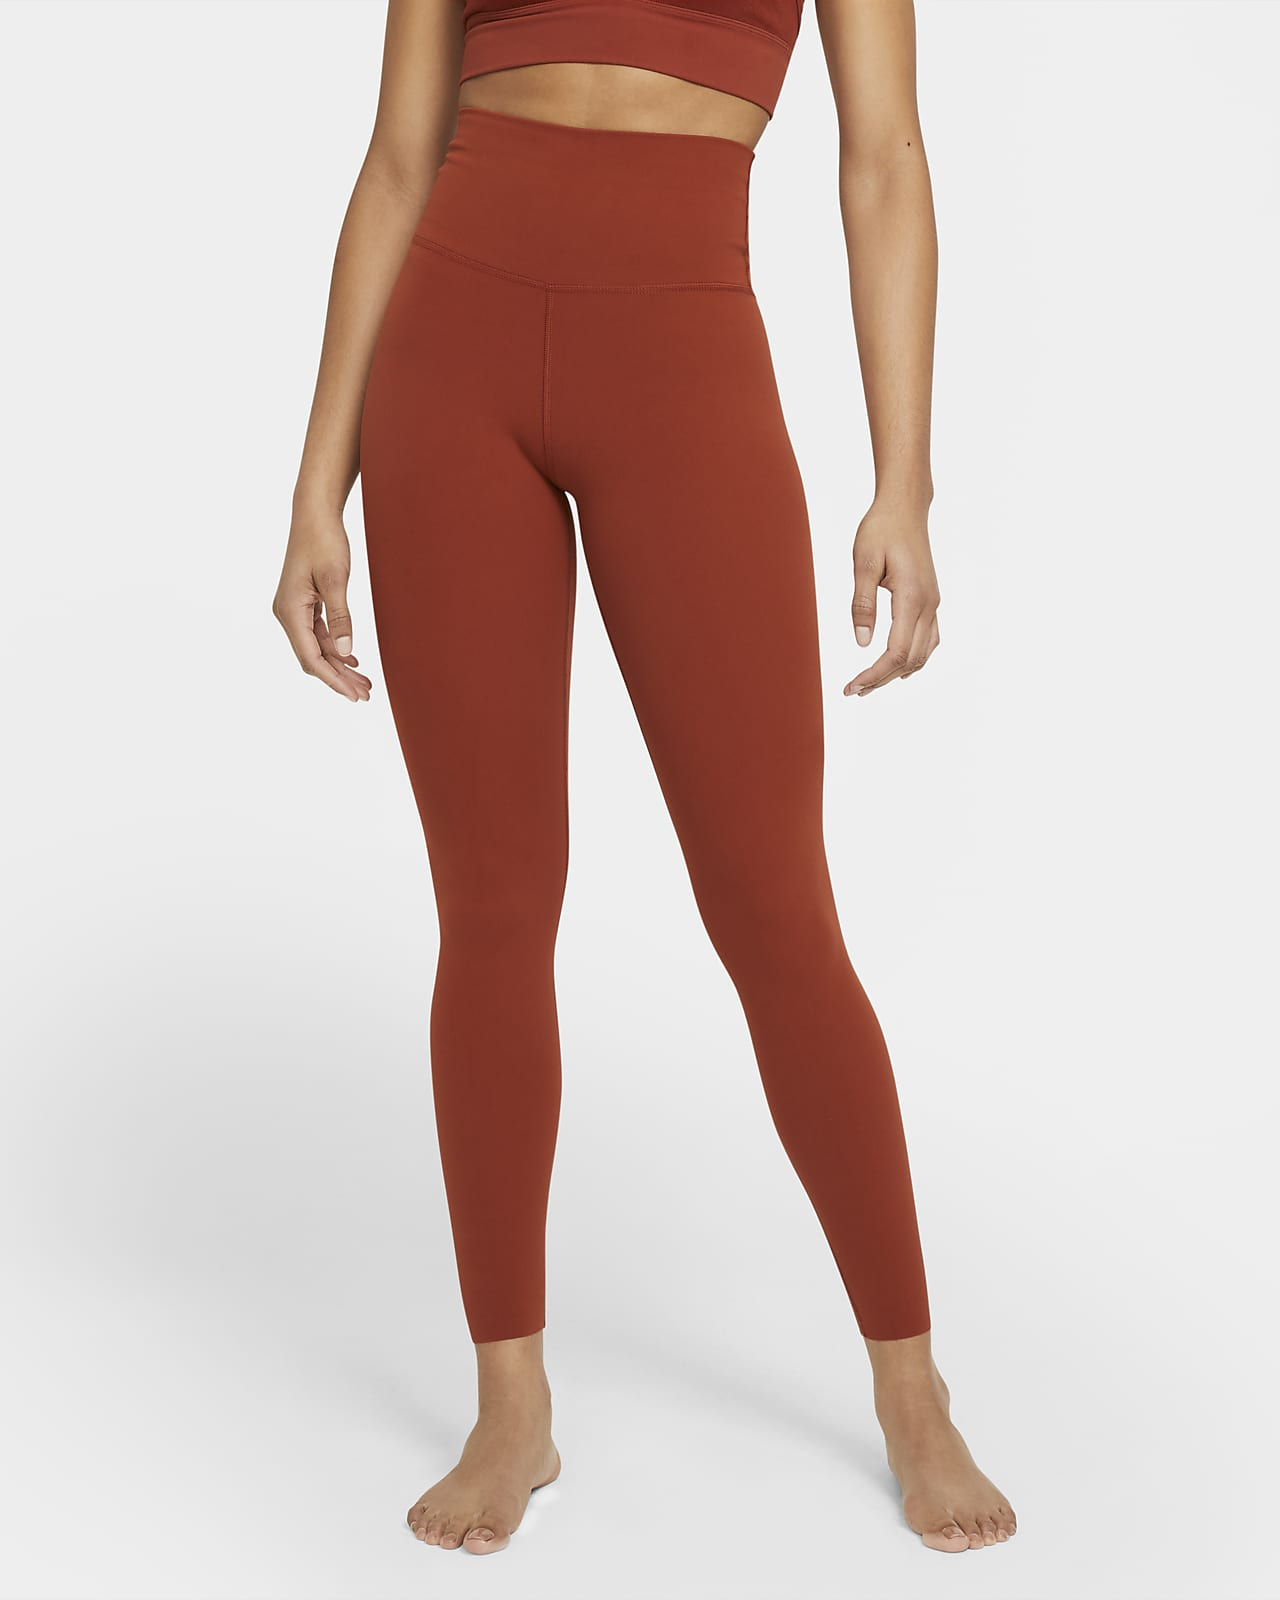 Nike Yoga Luxe Women's High-Waisted Leggings